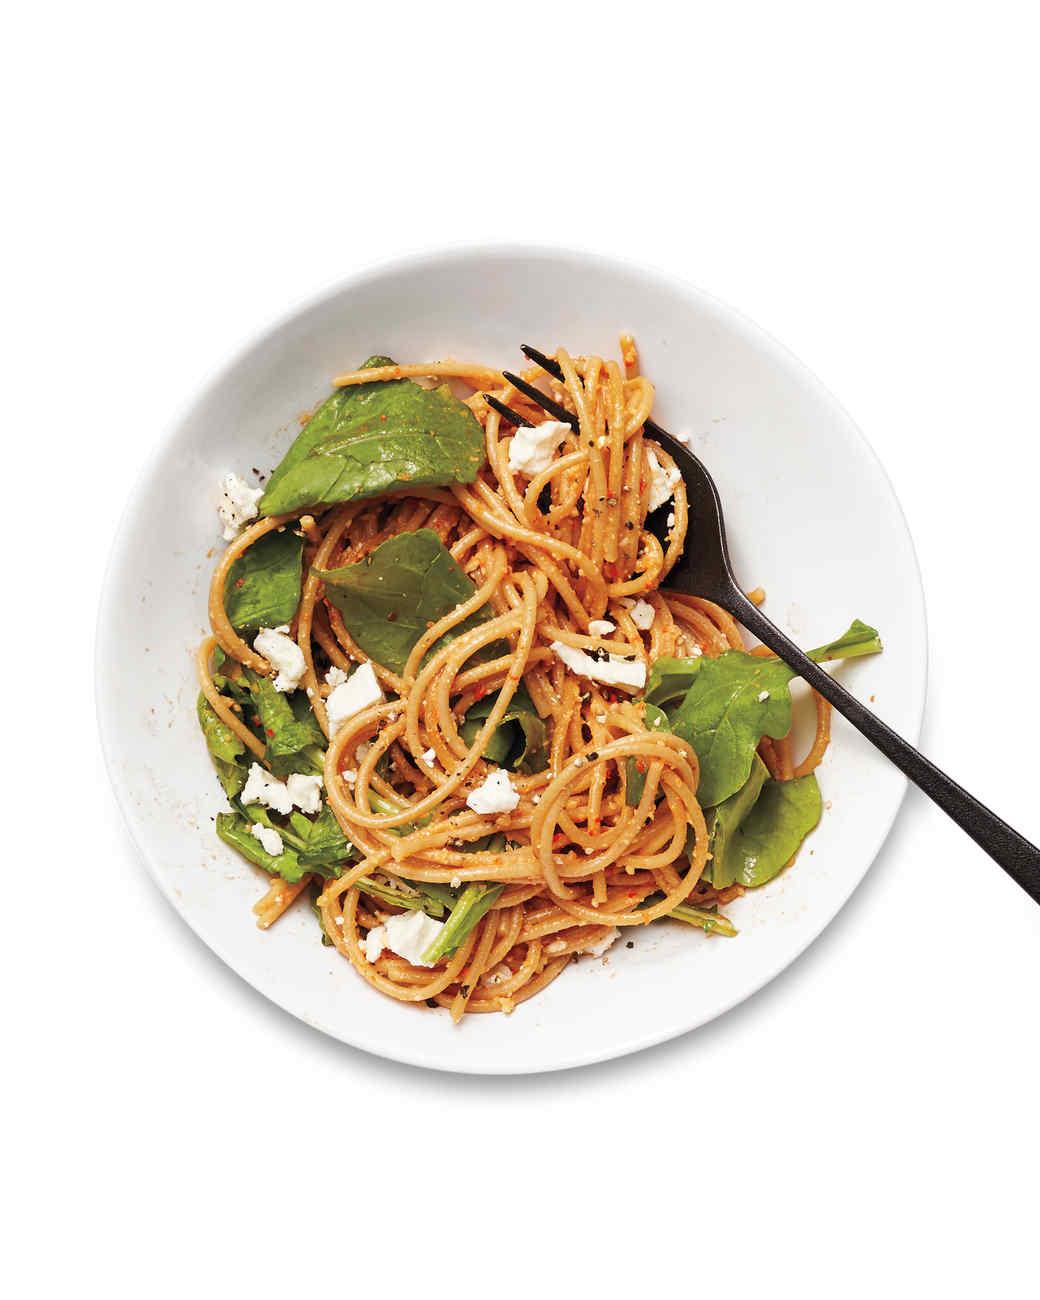 Easy recipes using spaghetti noodles